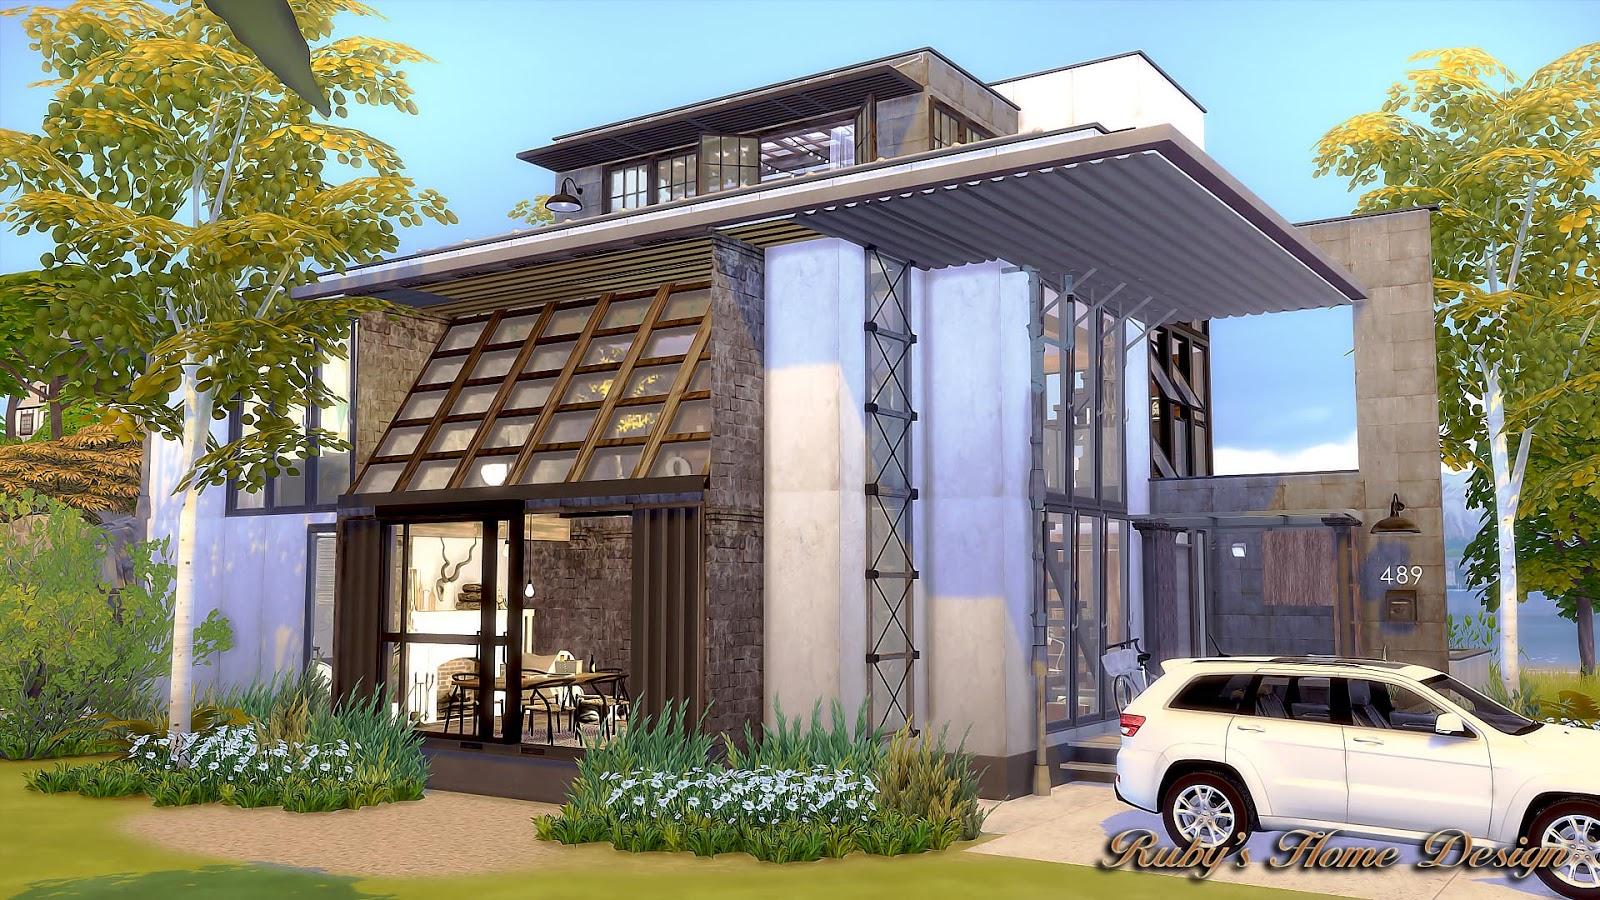 43ad222cafda9576 Minimalist Studio Apartment Design also Apartment Entrance Design By Birkan Sevinc besides 15556111 furthermore File Fakhro Tower typical corridor   Feb 2013 further West Village Townhouse Design. on apartment interior design